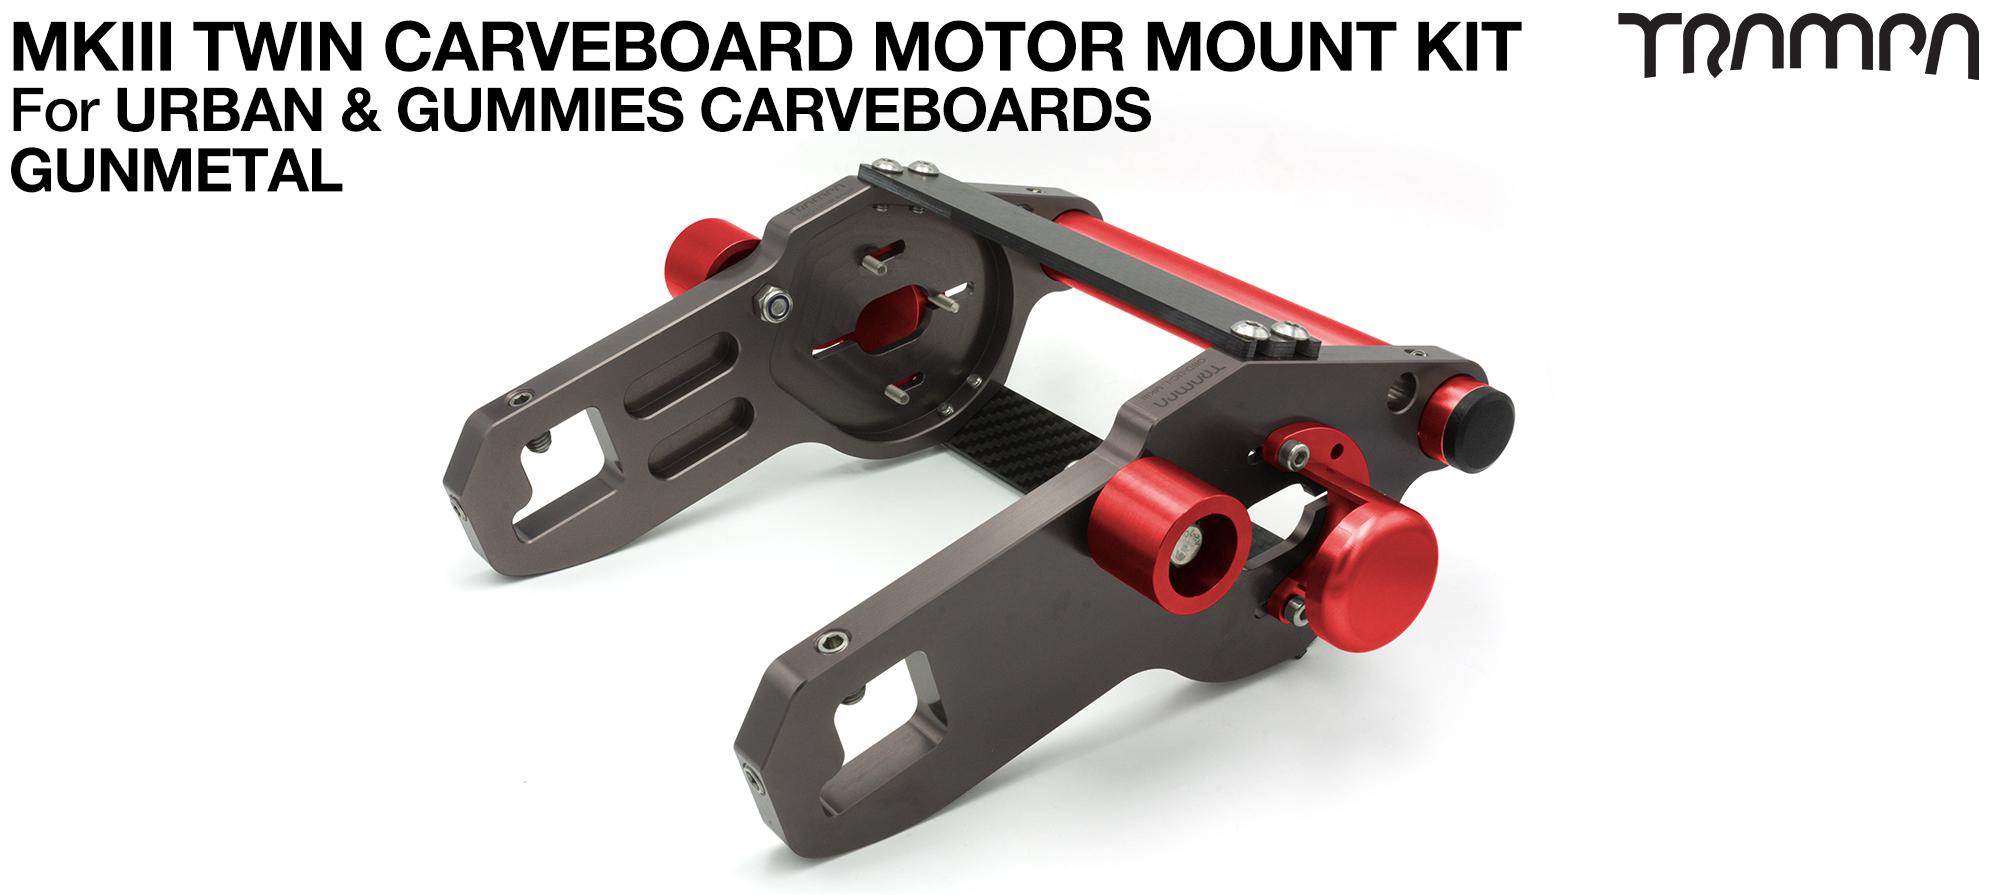 MkIII CARVE BOARD Motor Mount Kit - TWIN GUNMETAL